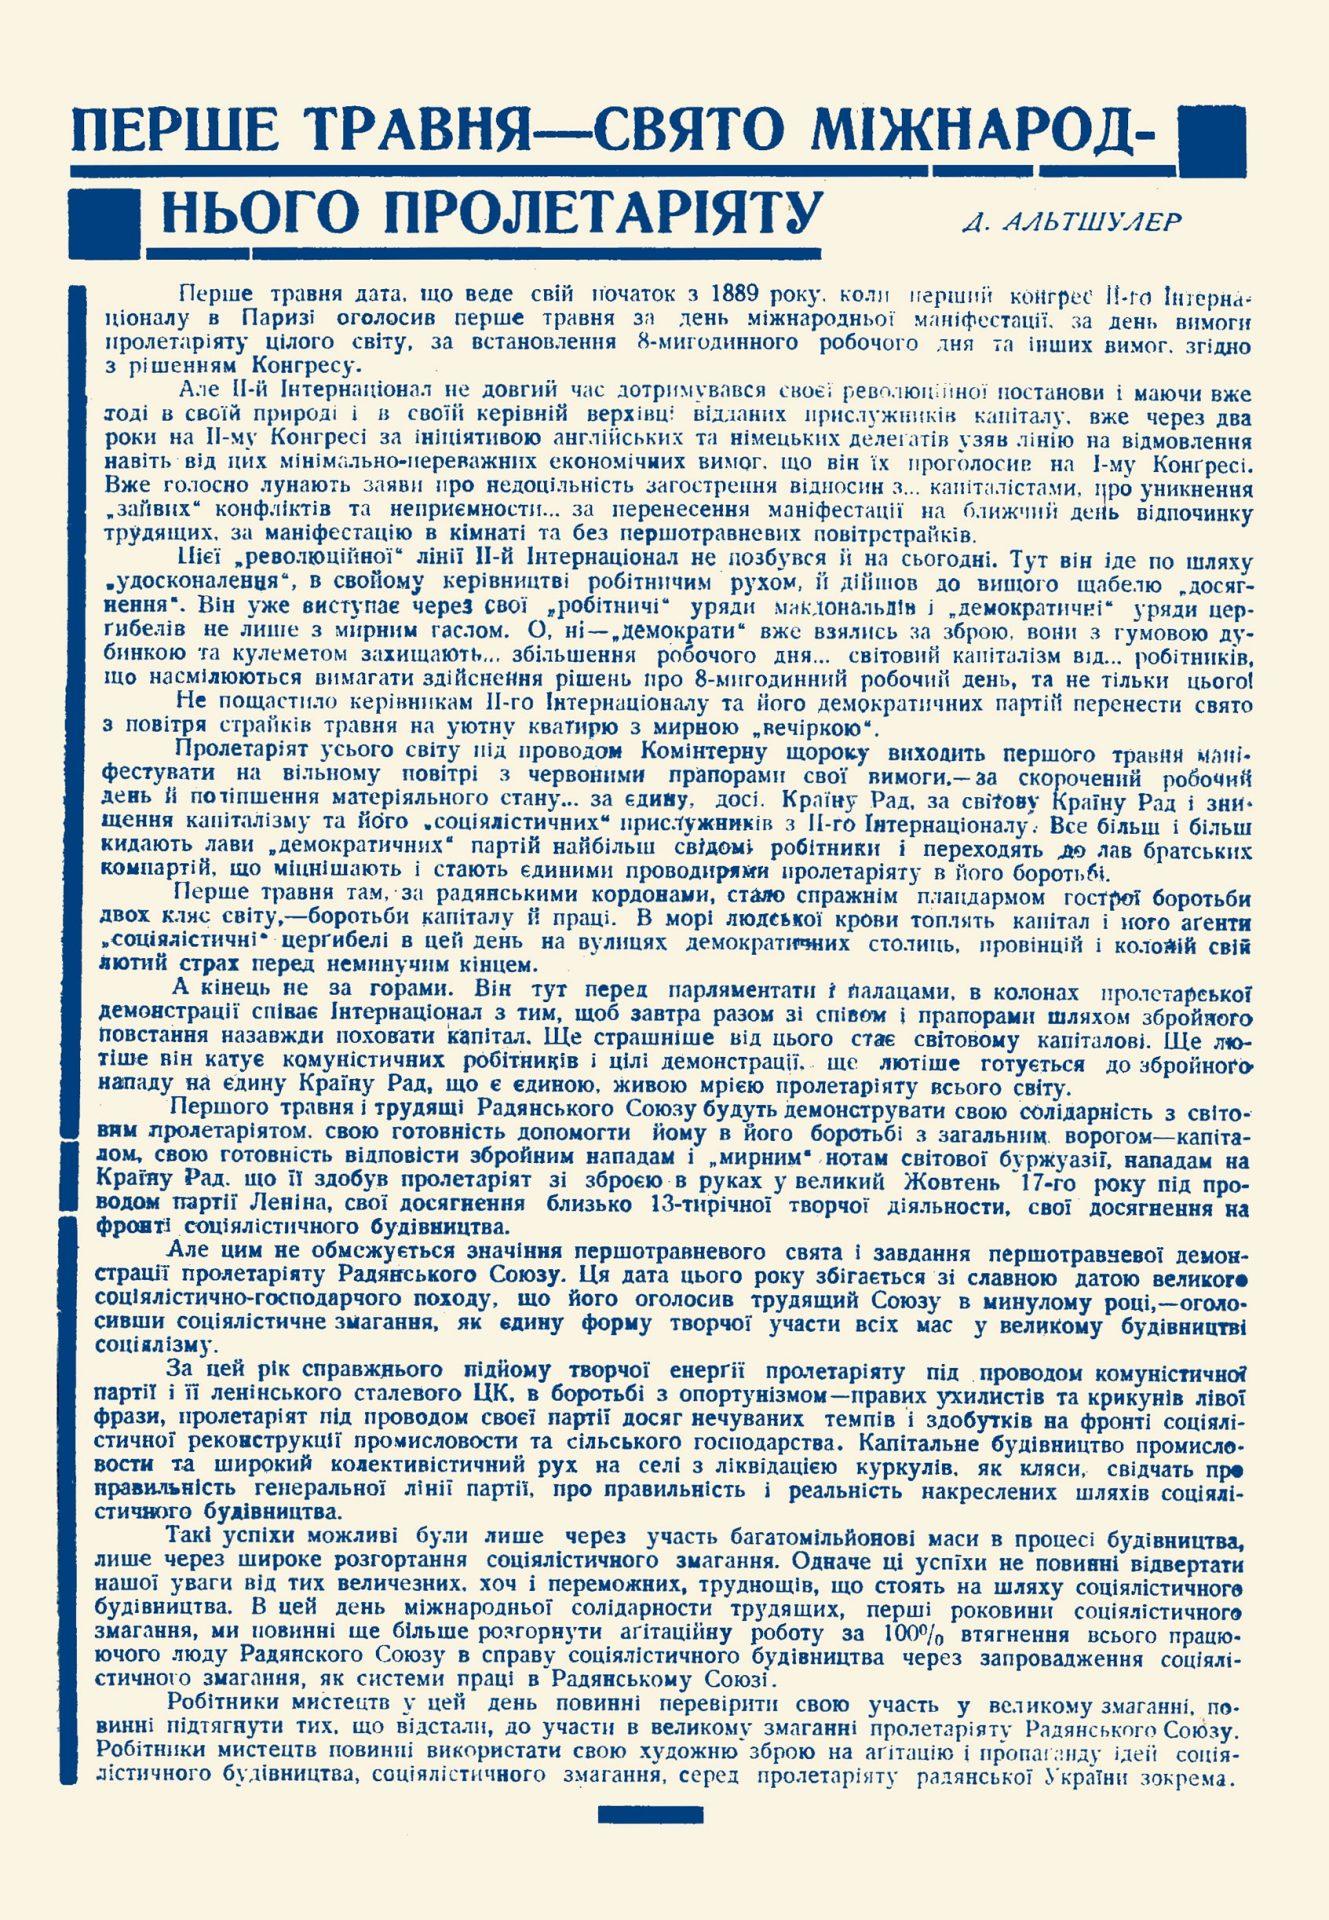 Мистецька трибуна_1930_№ 5